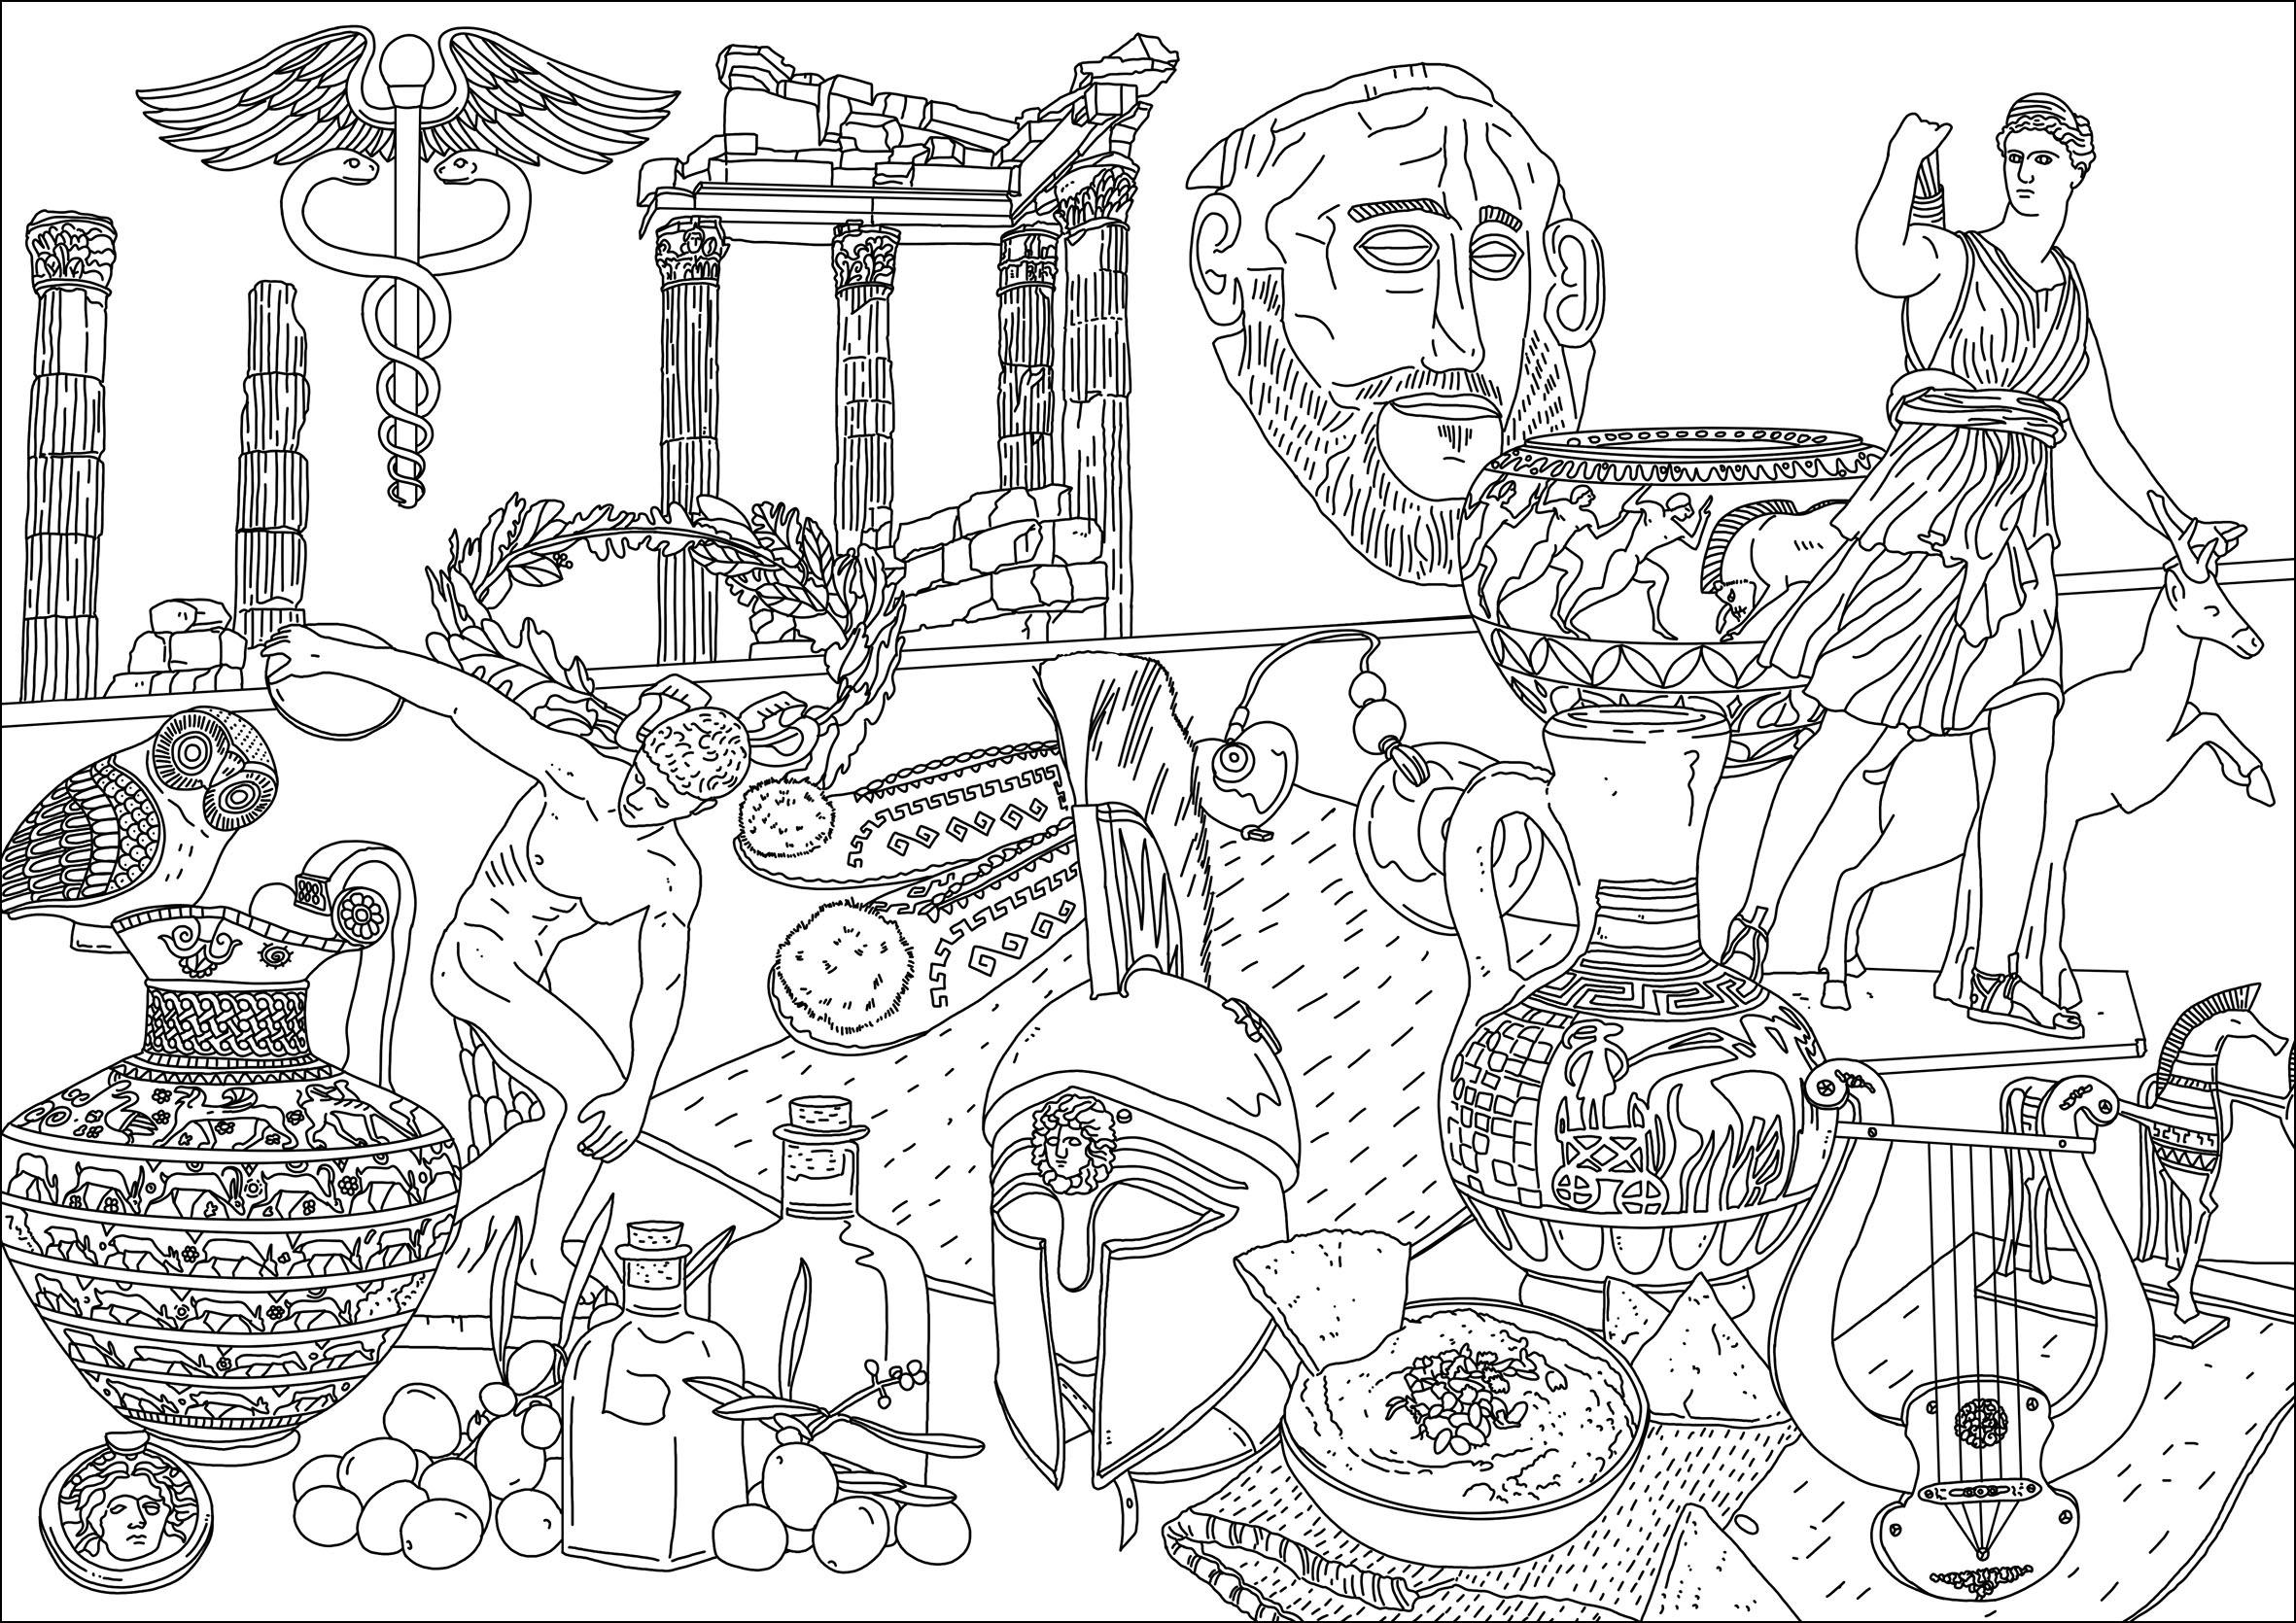 Différents symboles de la Grèce. Statues, temples, masques, instruments de musique ...